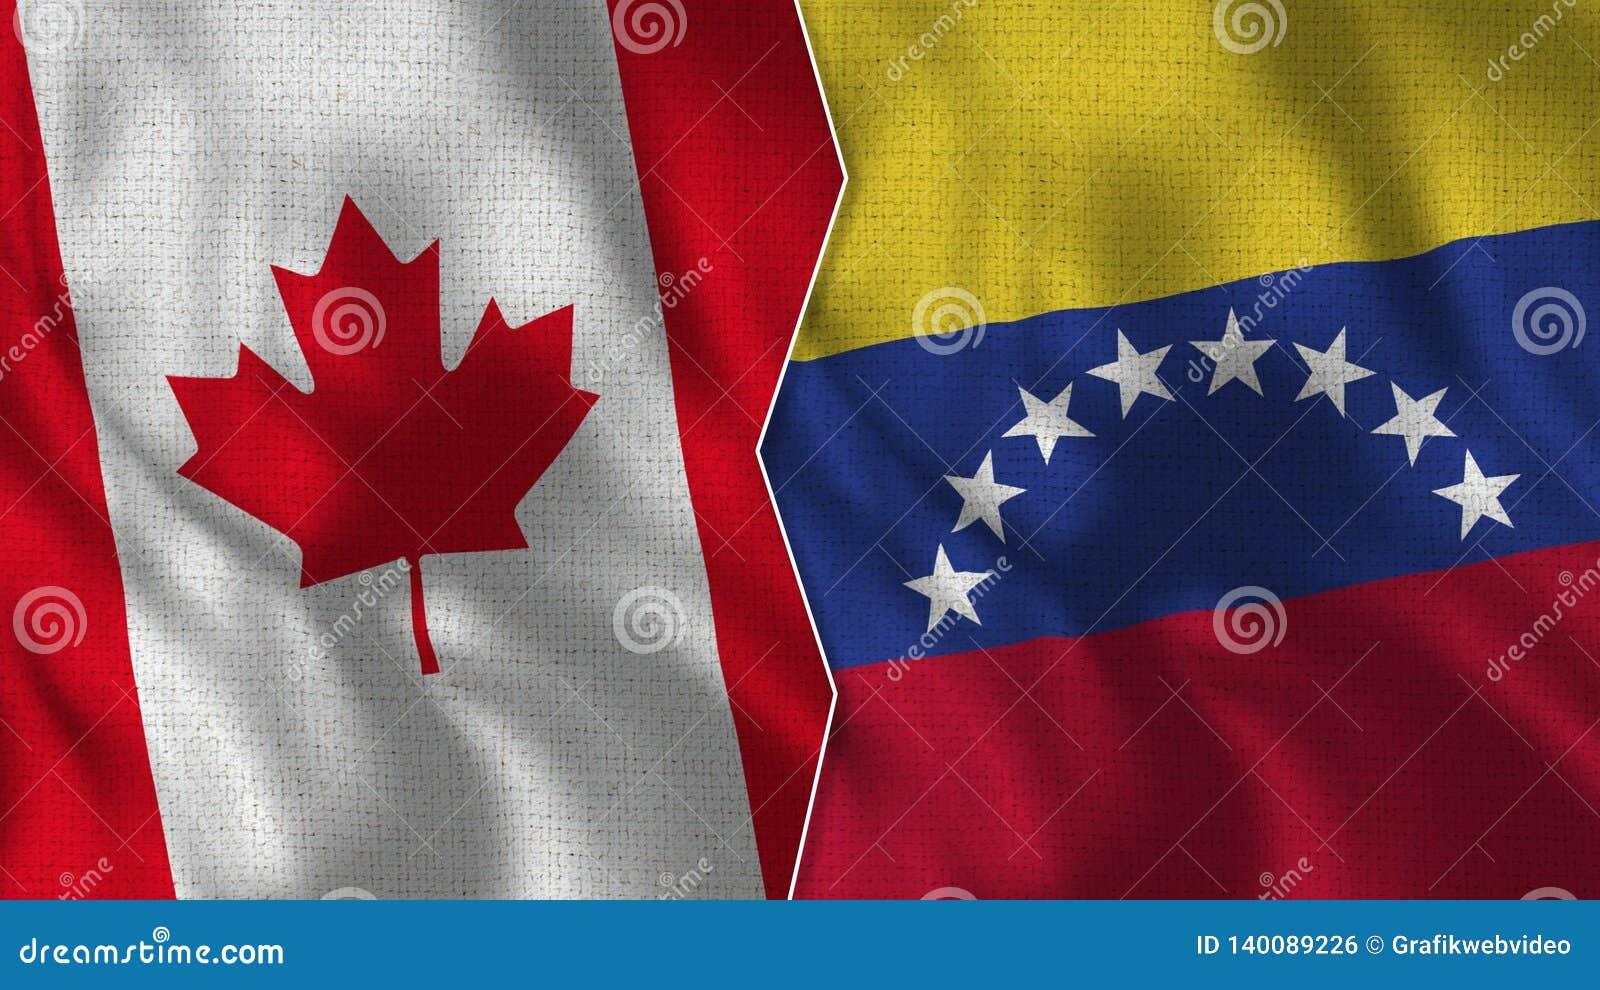 Canada and Venezuela Half Flags Together